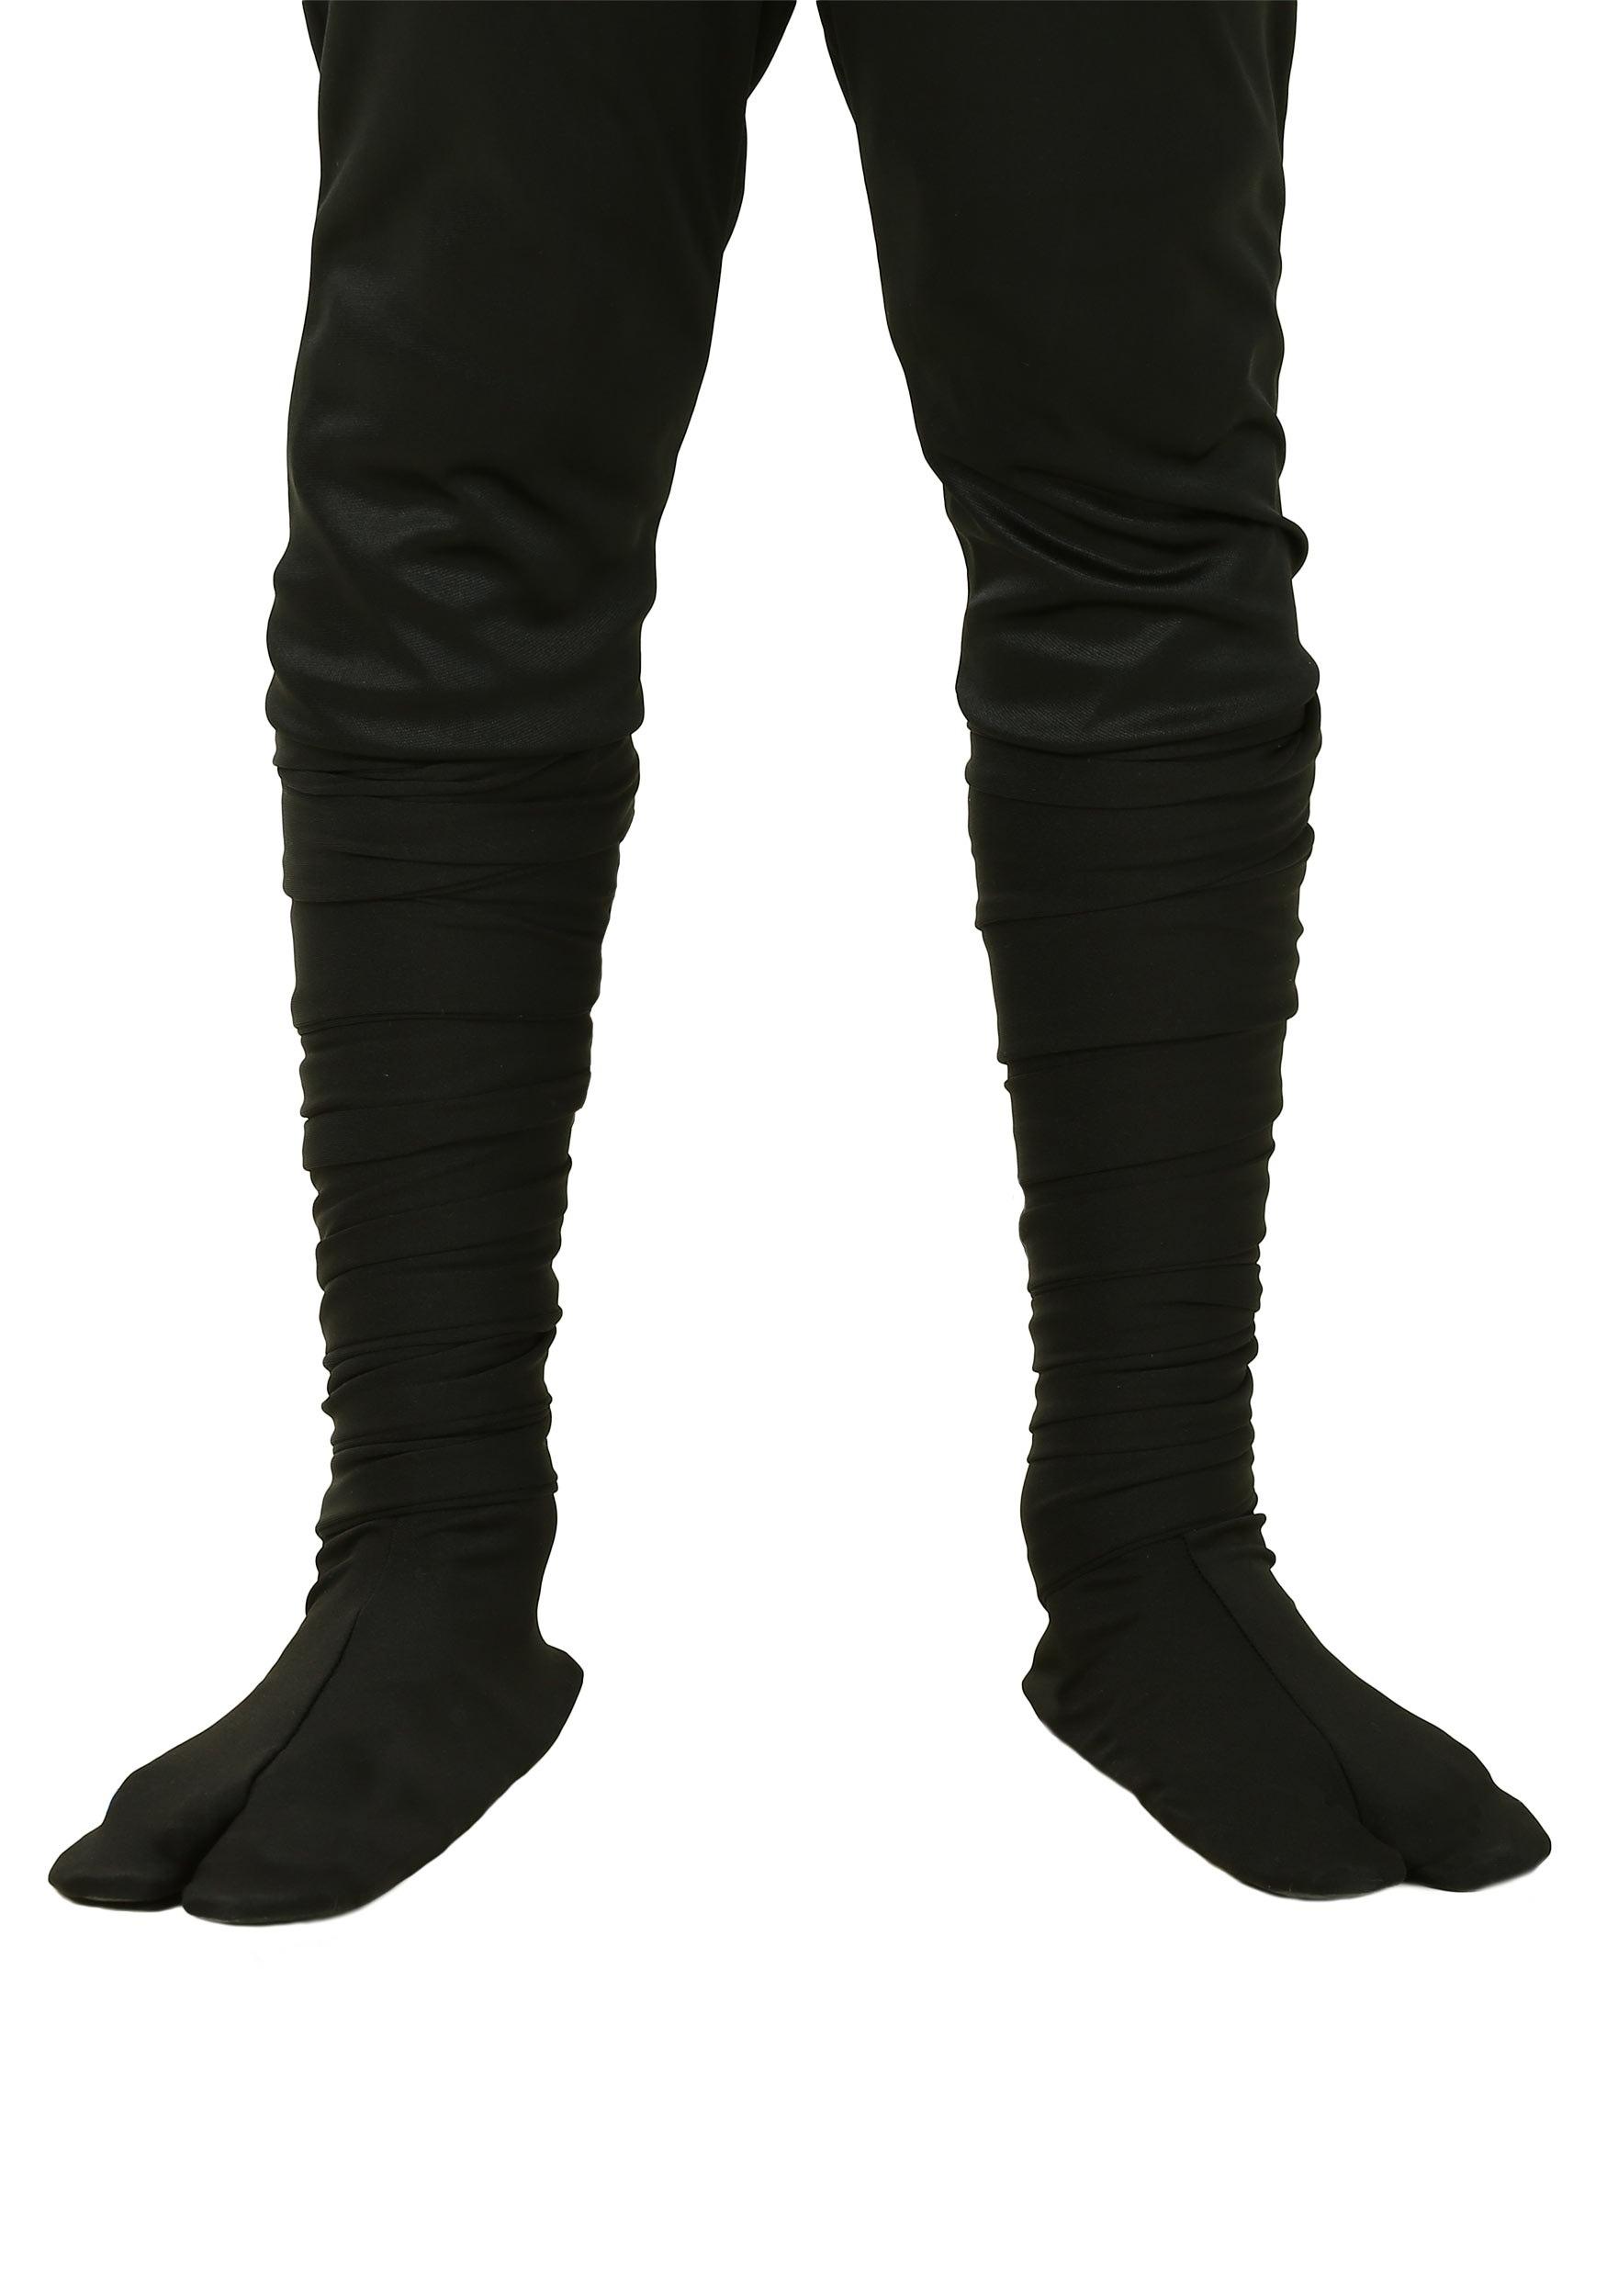 Ninja Boots For Child